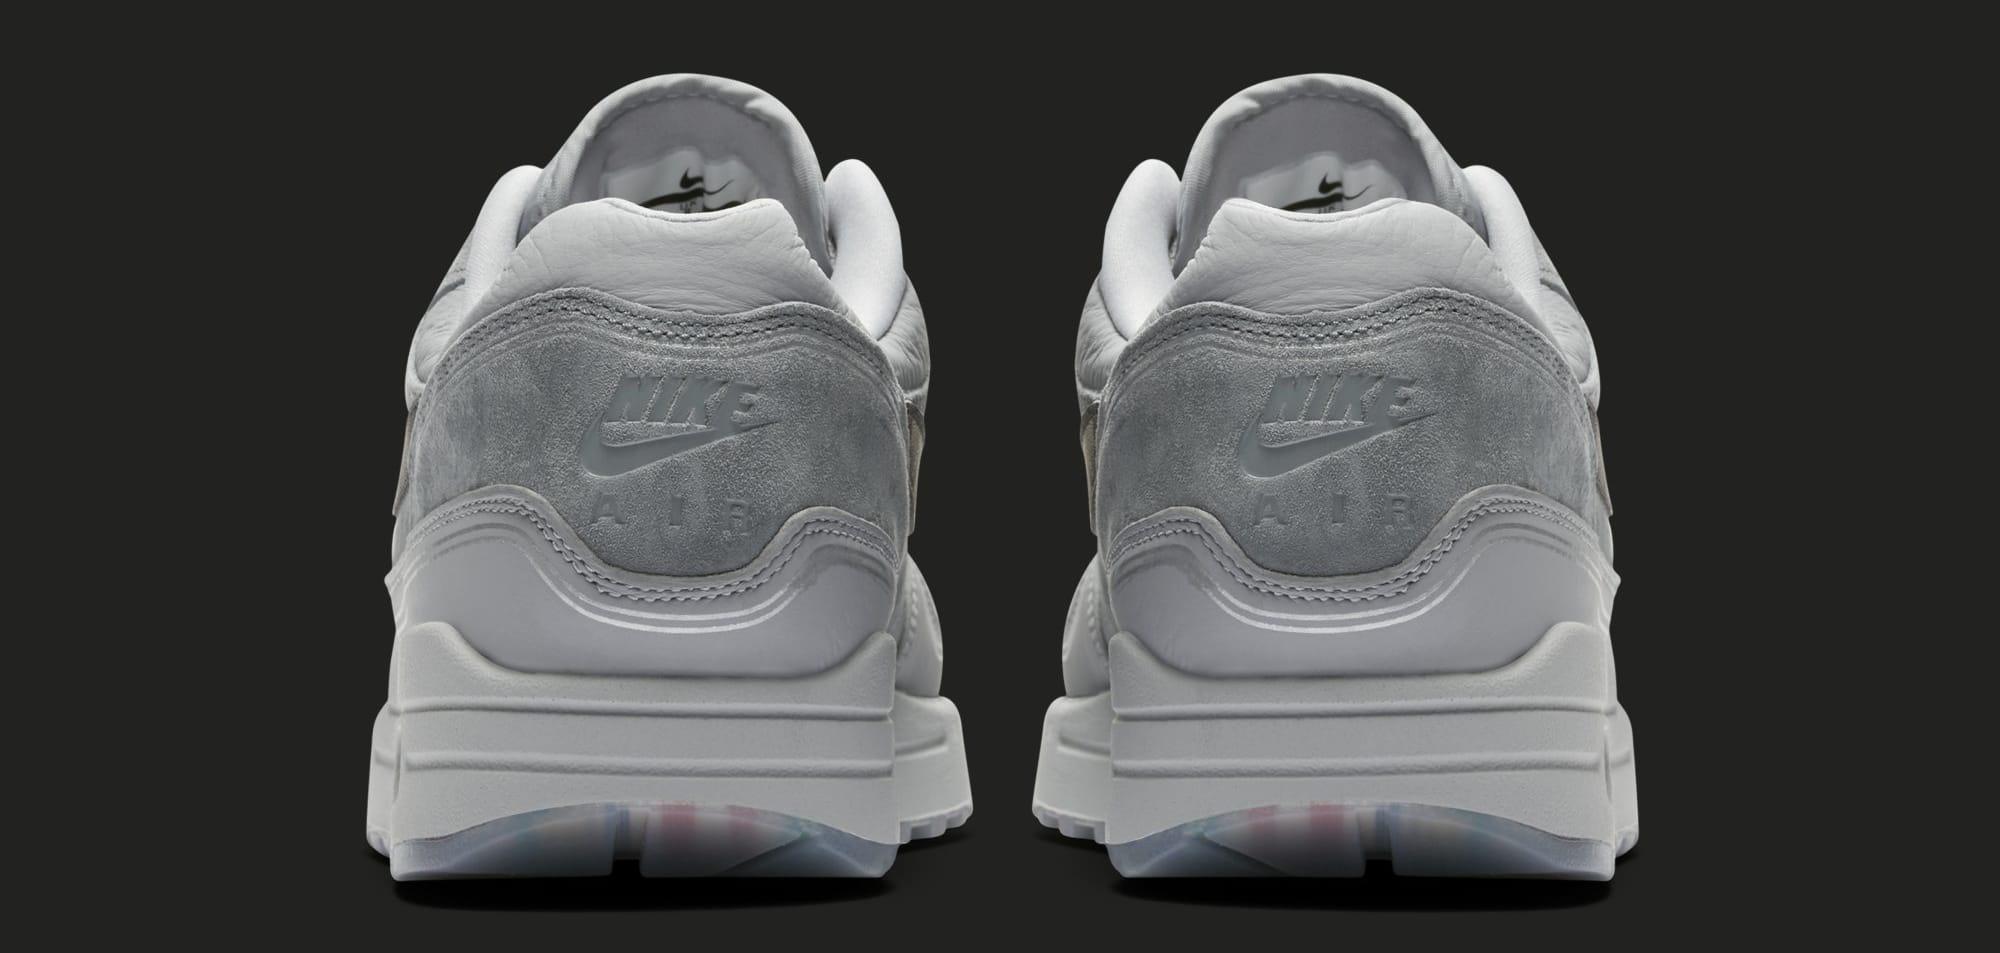 promo code fdc71 37401 Image via Nike Nike Air Max 1  Centre Pompidou  Wolf Grey AV3735-001 (Heel)